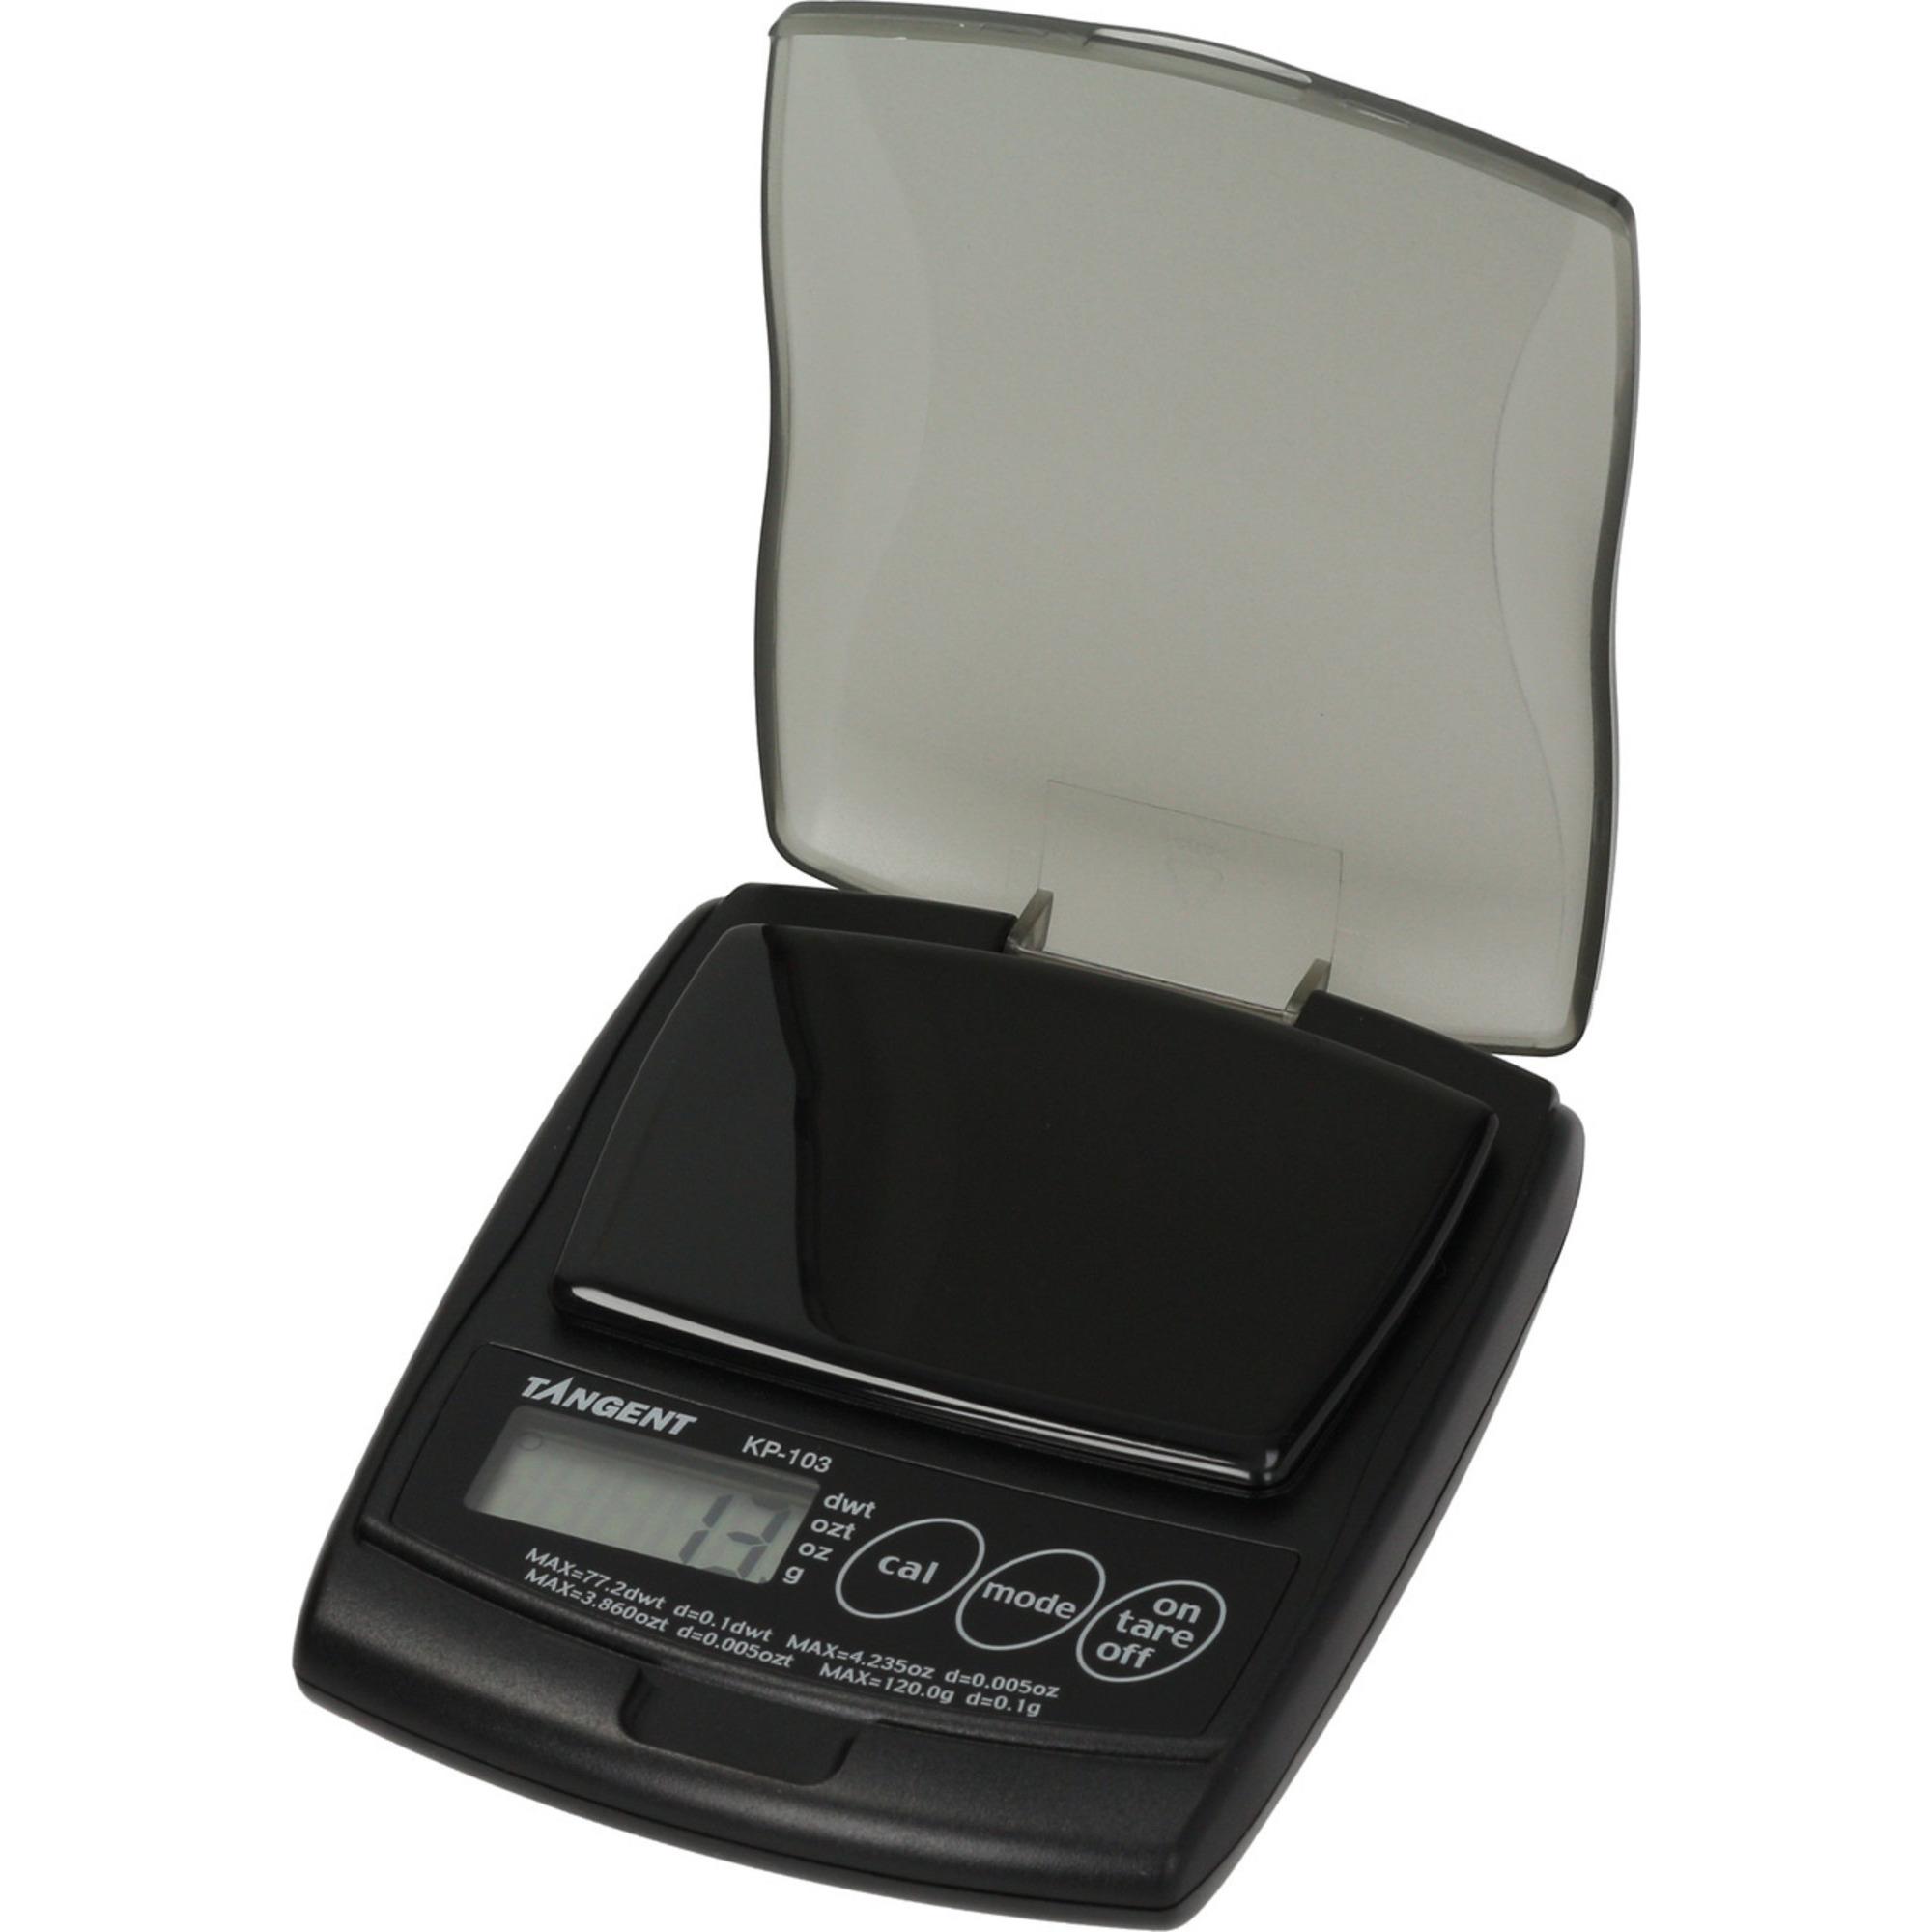 LF Digital Våg Tangent 120 g